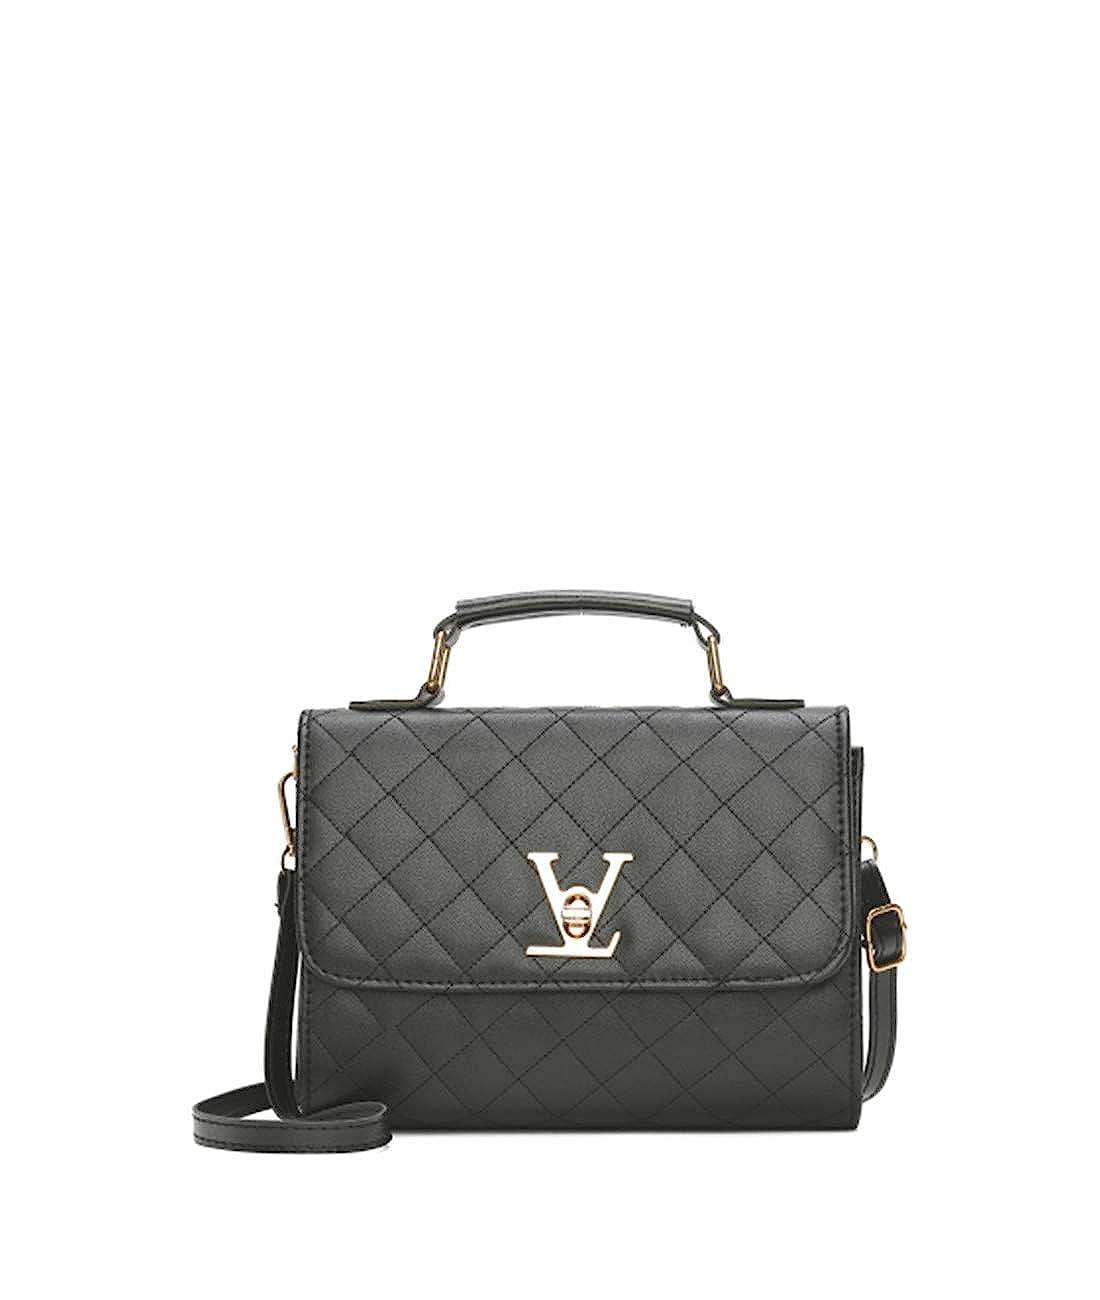 HARLAN Womens Crossbody Bag Chic Style OL Style Bag